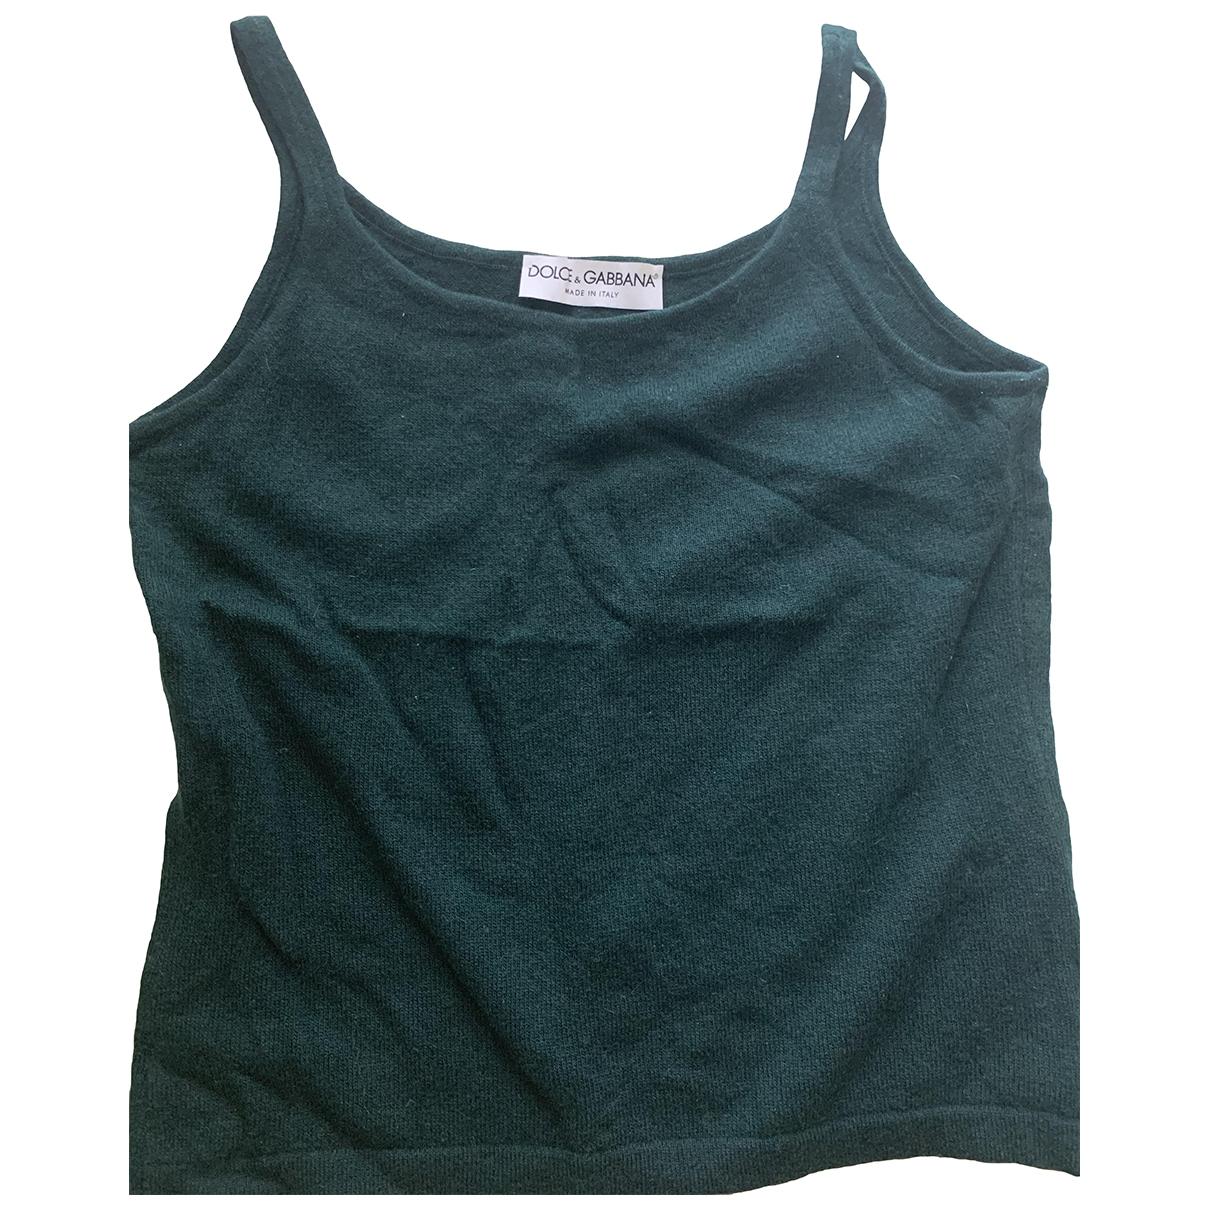 Dolce & Gabbana \N Green Cashmere  top for Women 38 IT